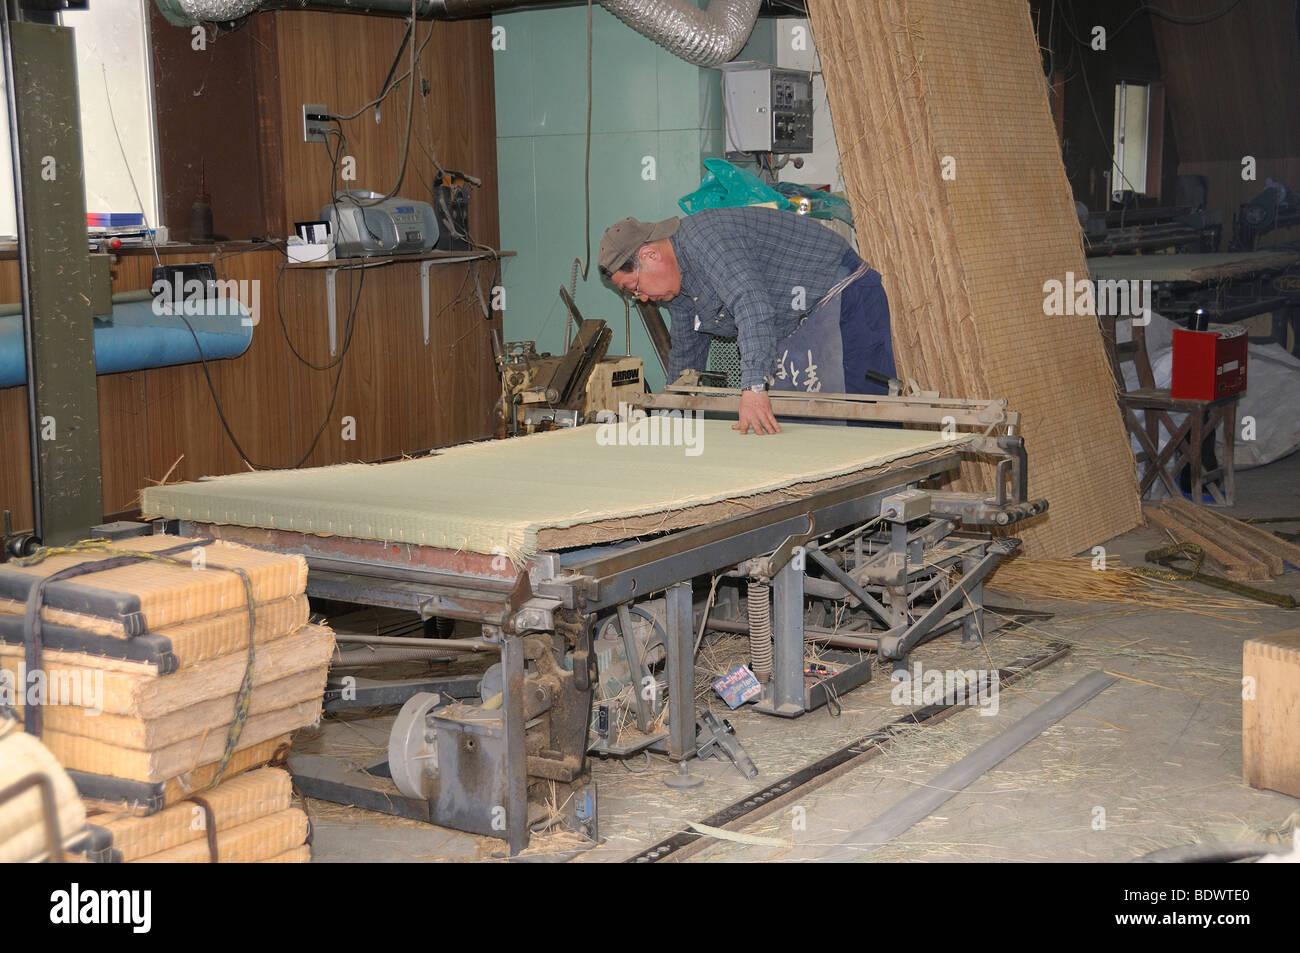 Manufacture of tatami flooring for traditional Japanese rooms in Sasayama, Japan, Asia - Stock Image